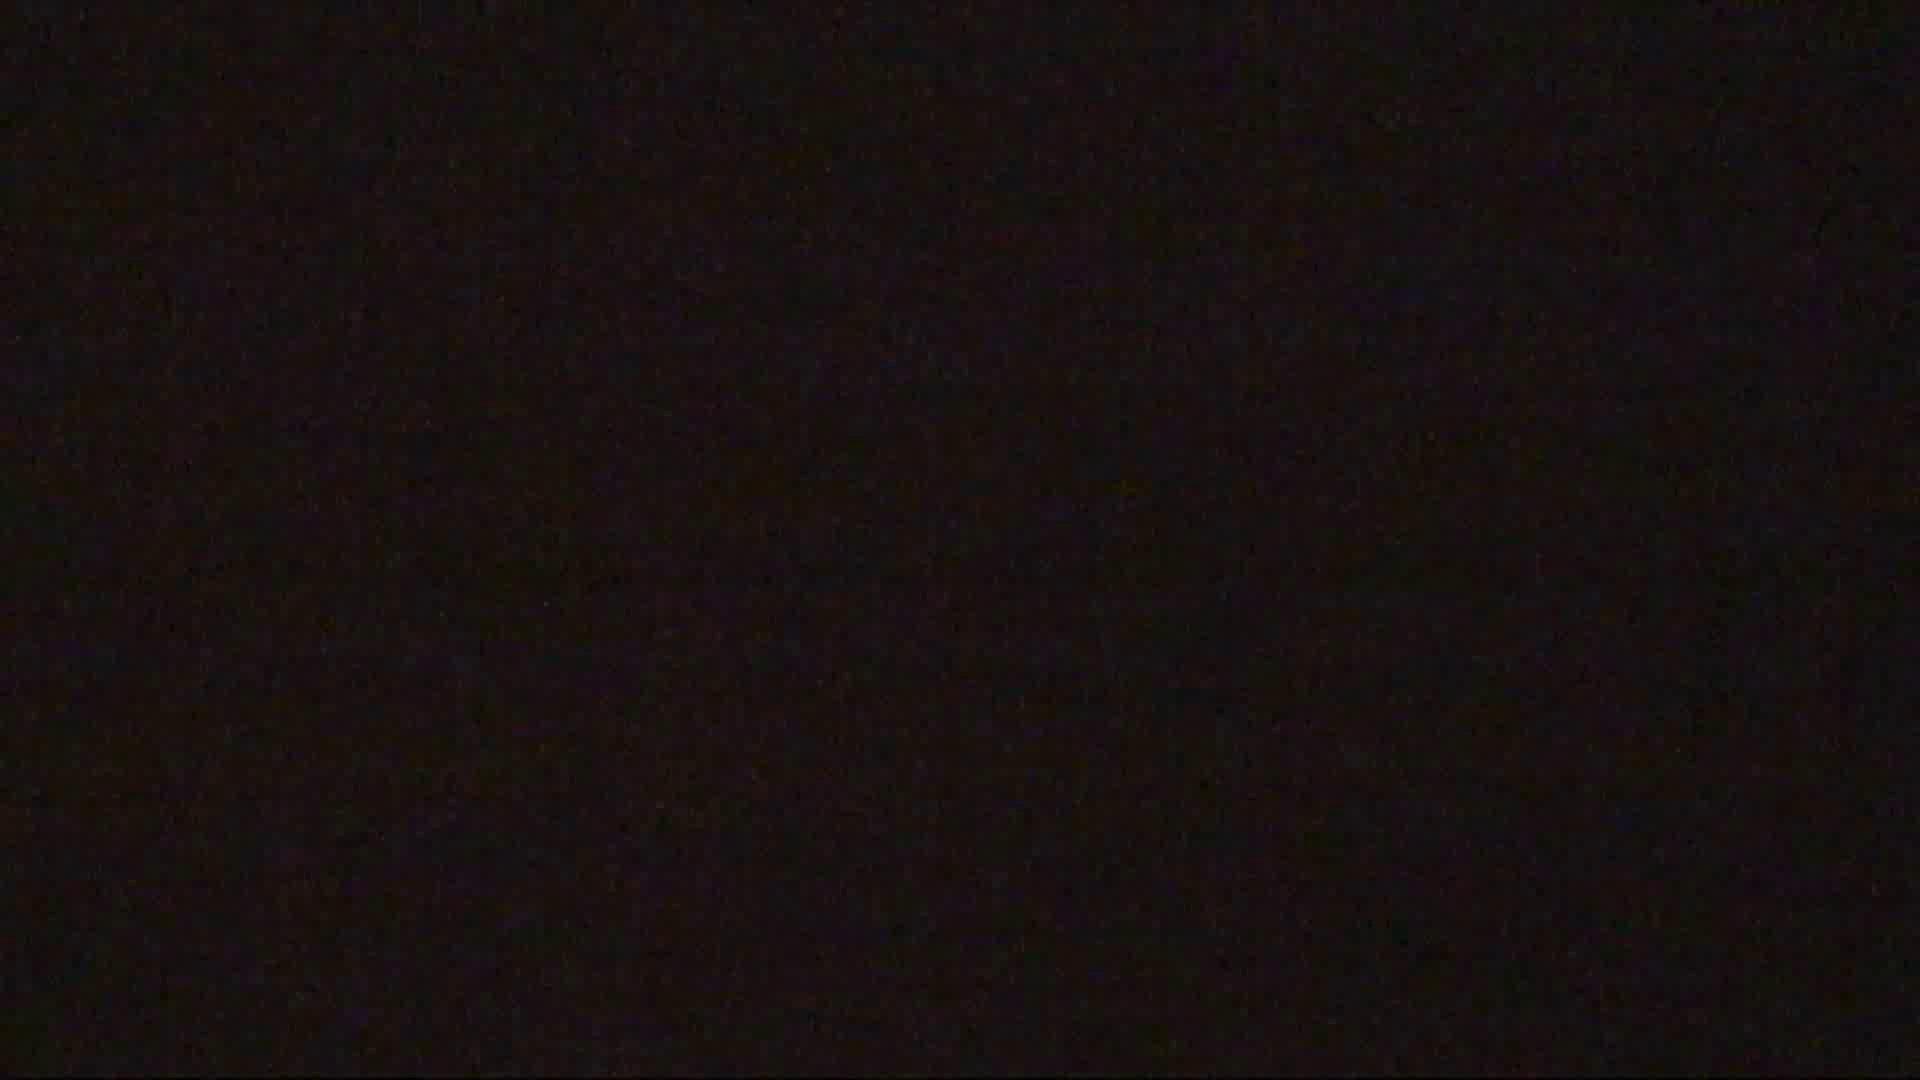 vol.02超可愛すぎる彼女の裸体をハイビジョンで!至近距離での眺め最高! エッチな盗撮 オマンコ動画キャプチャ 78pic 63